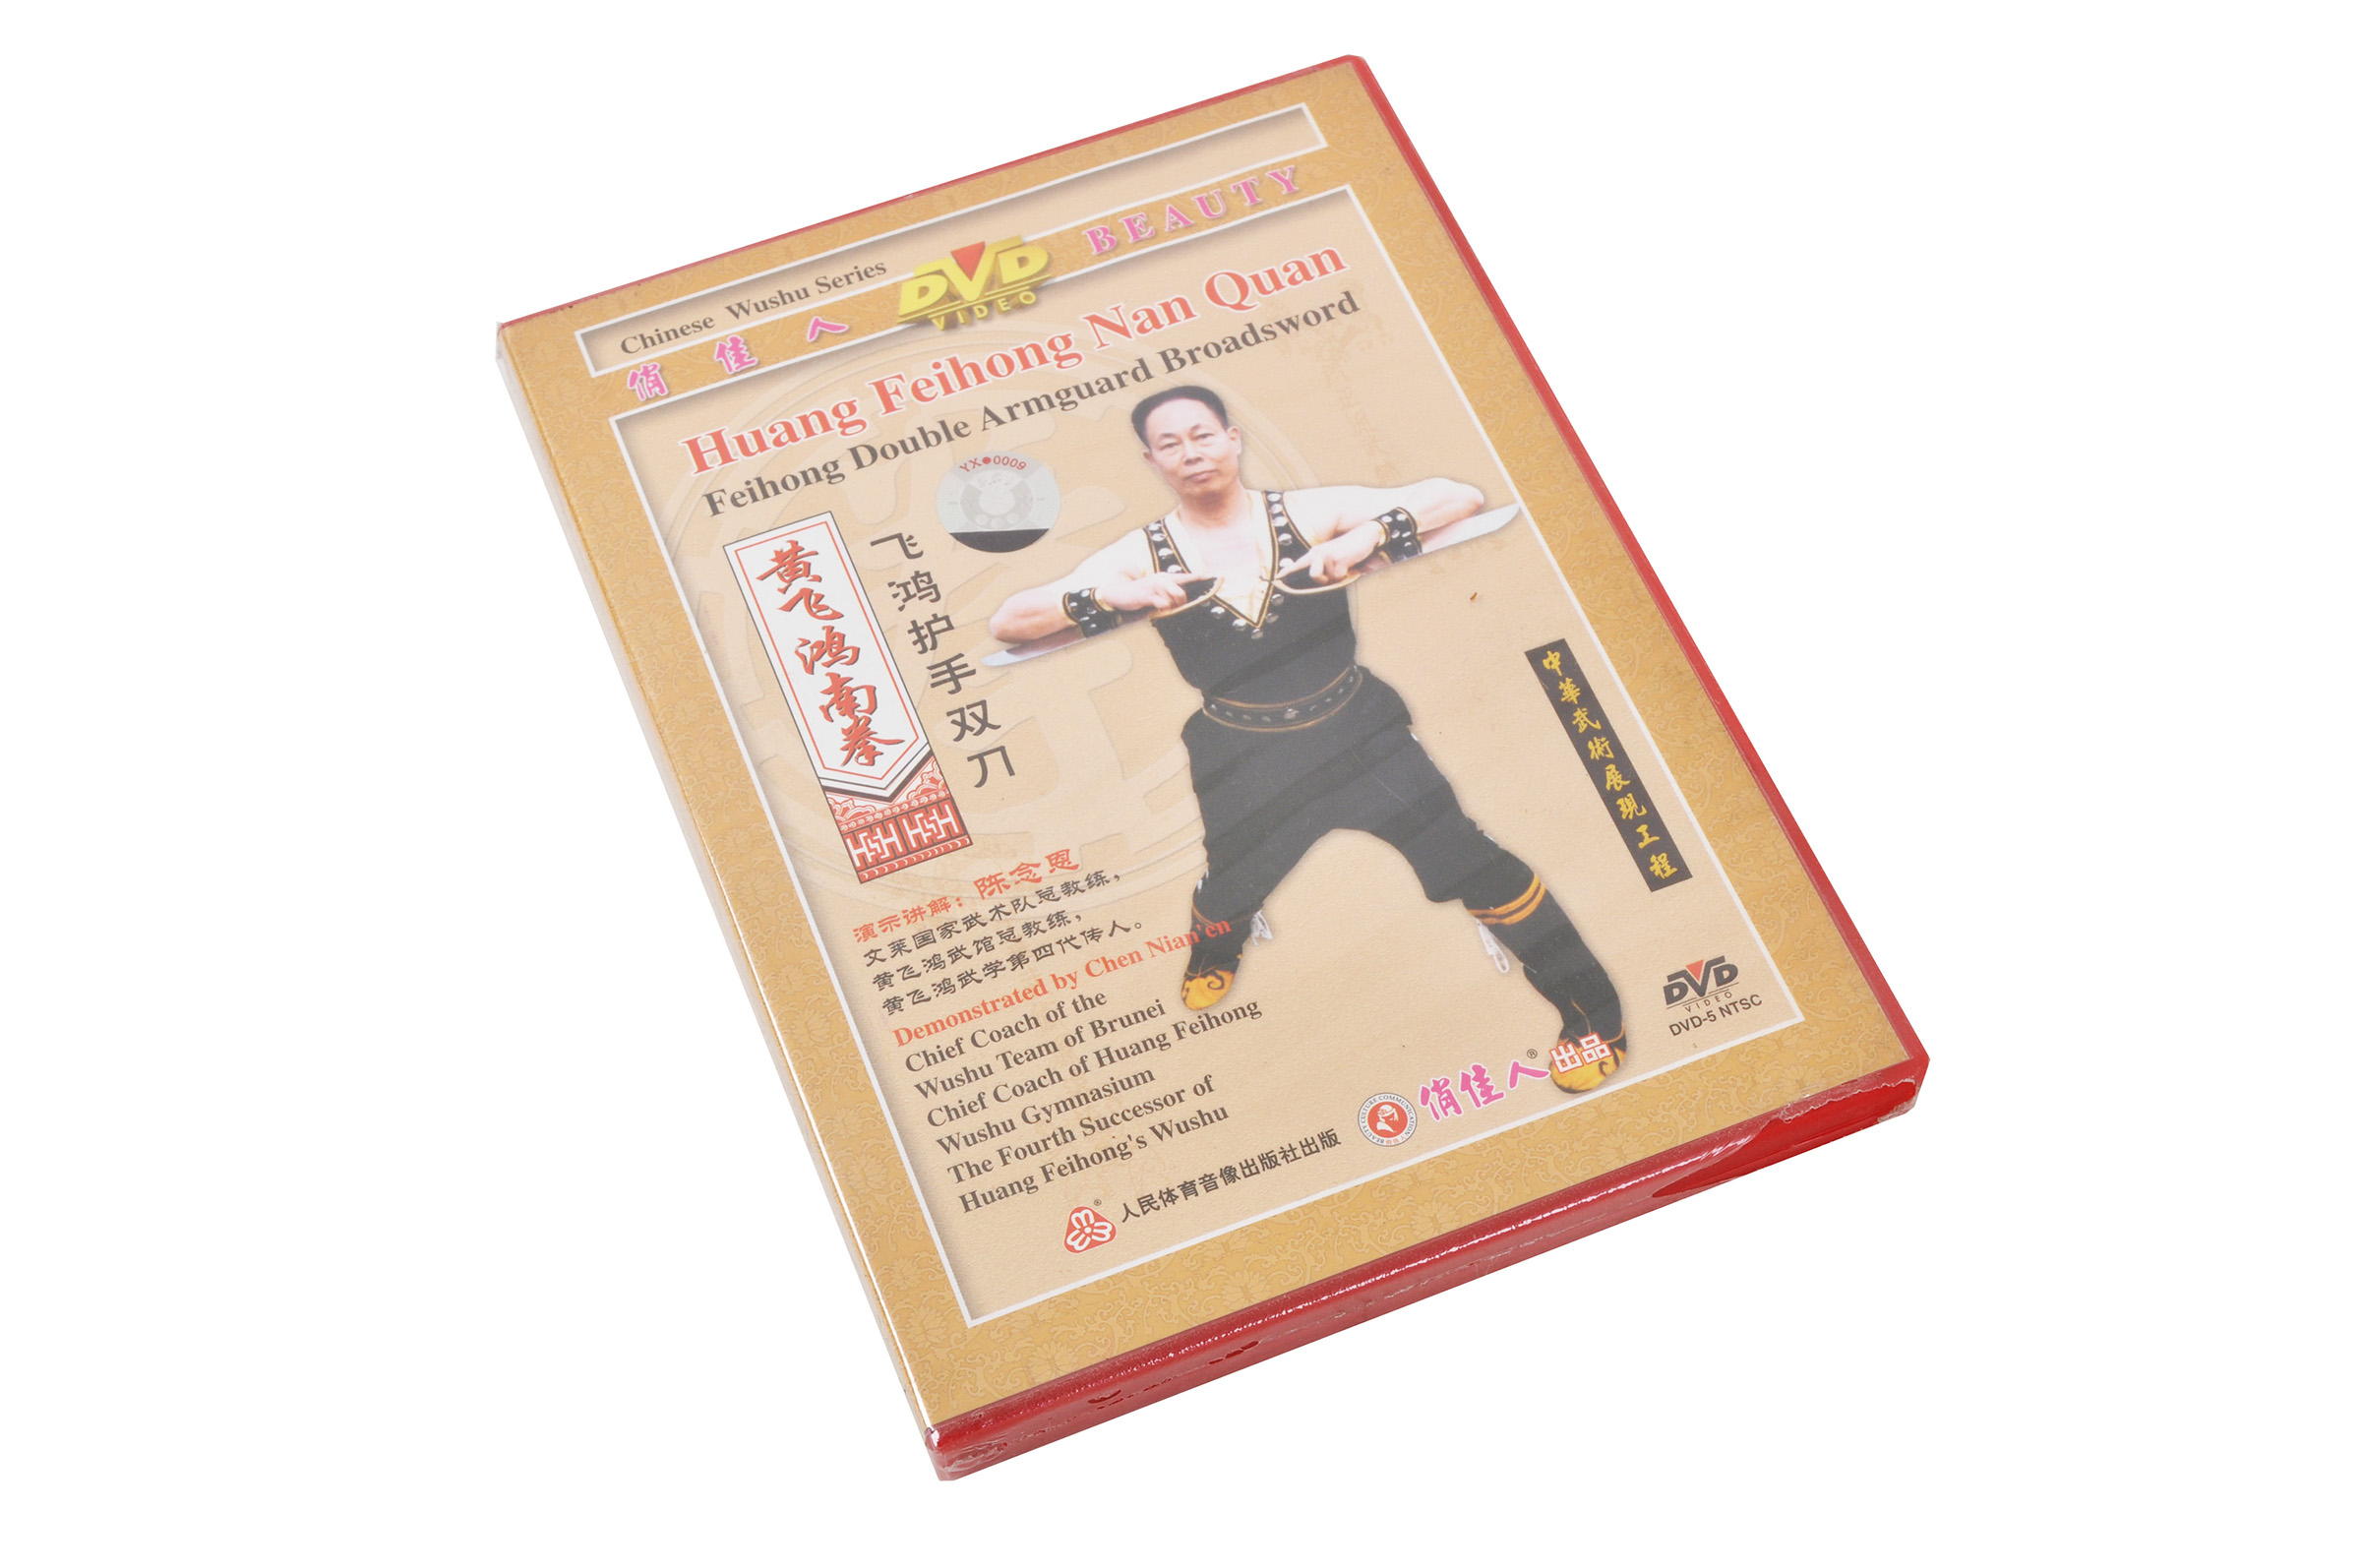 [DVD] Série Nan Quan - Couteaux Yongchun